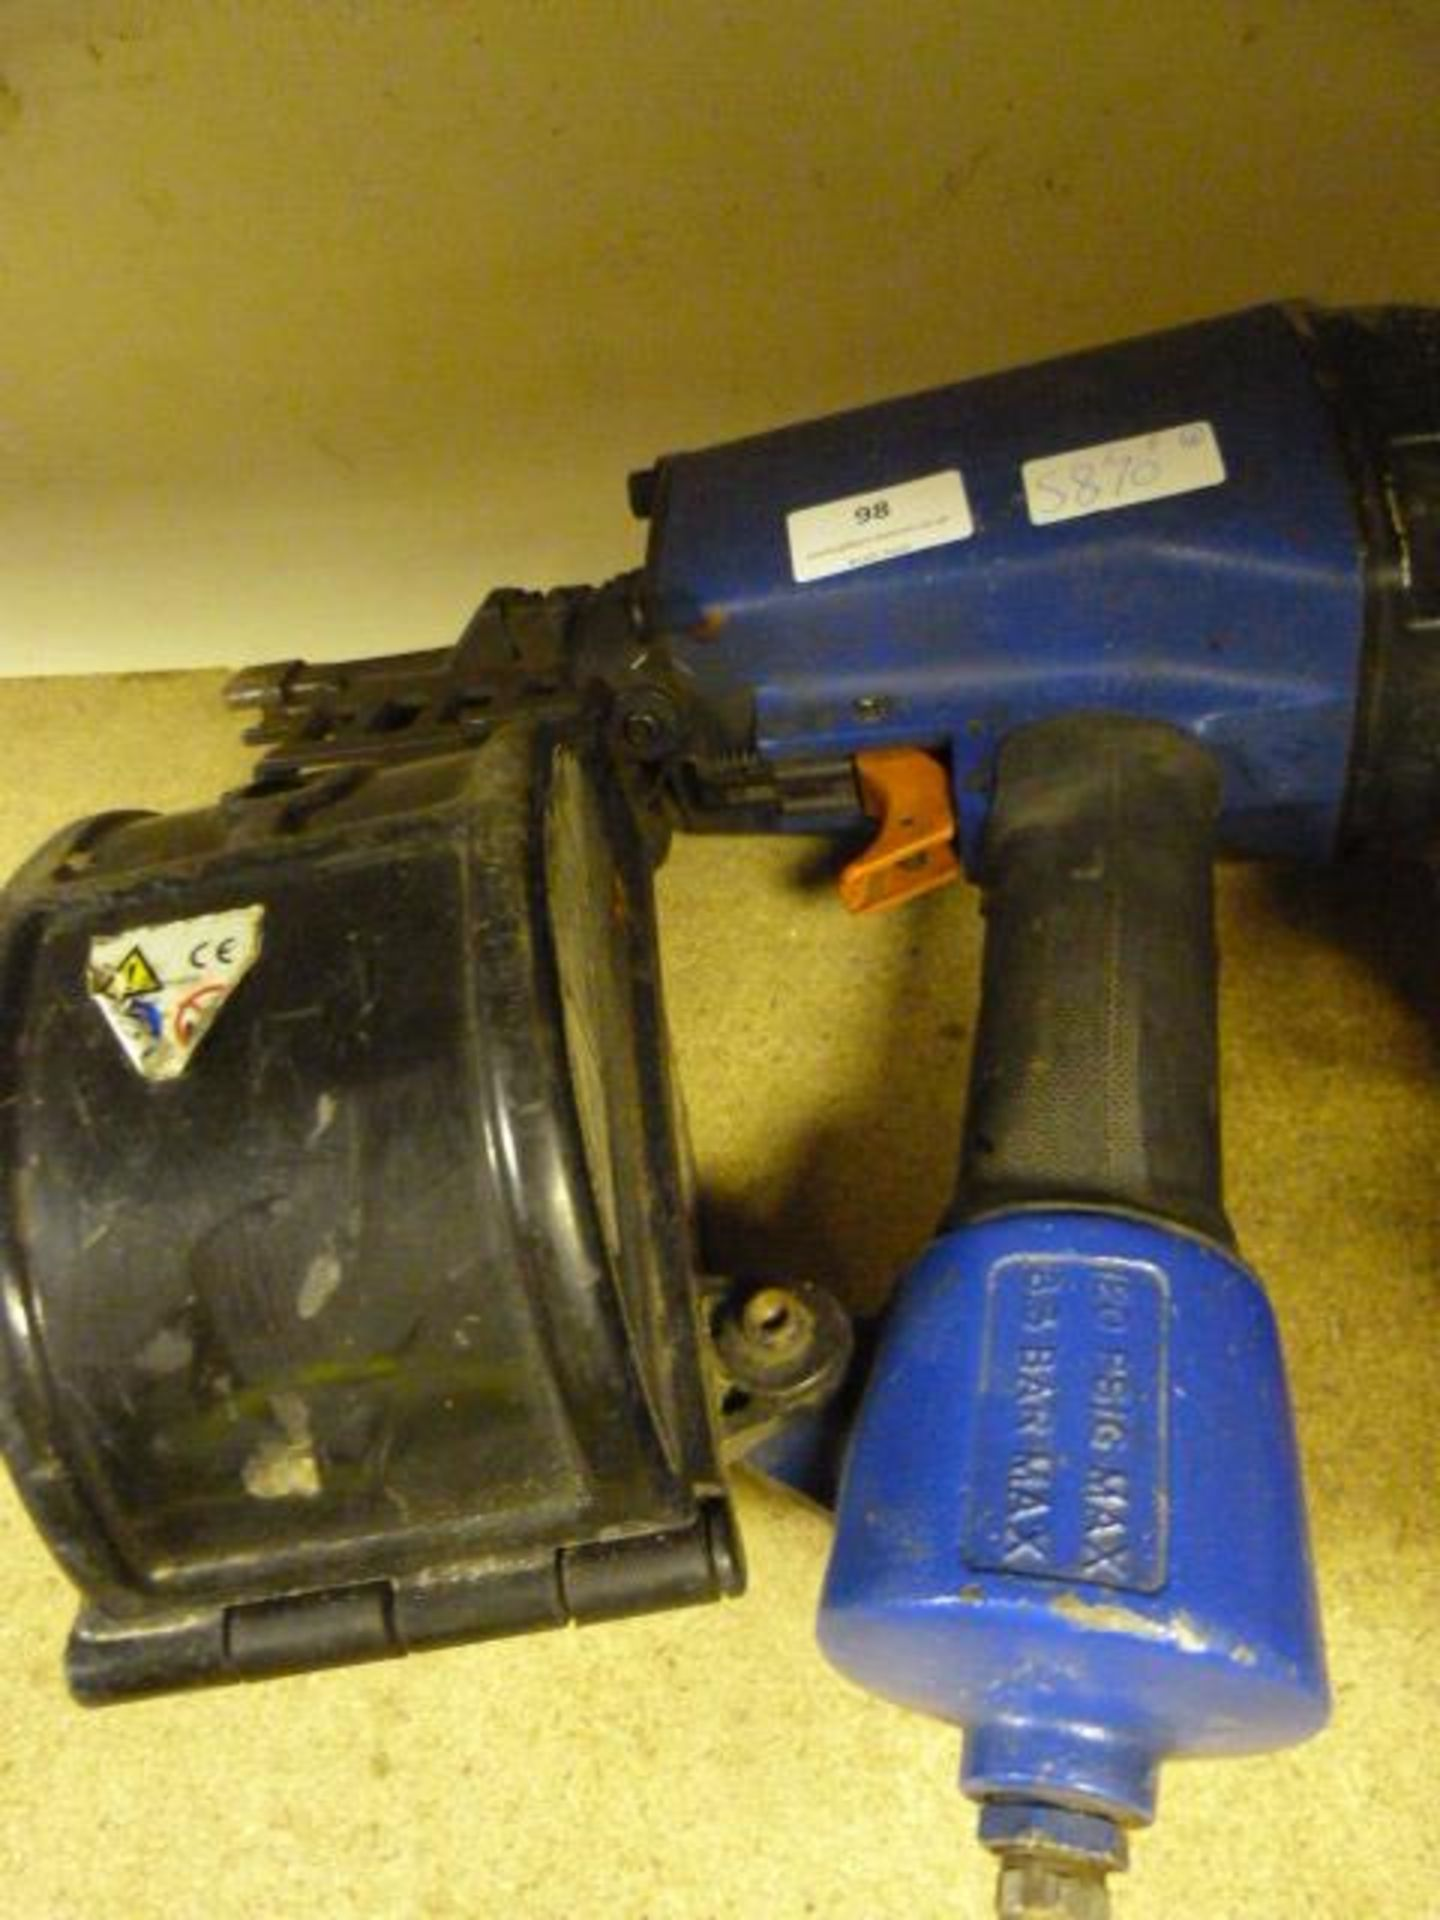 Lot 98 - Duo Fast Pneumatic Nail Gun